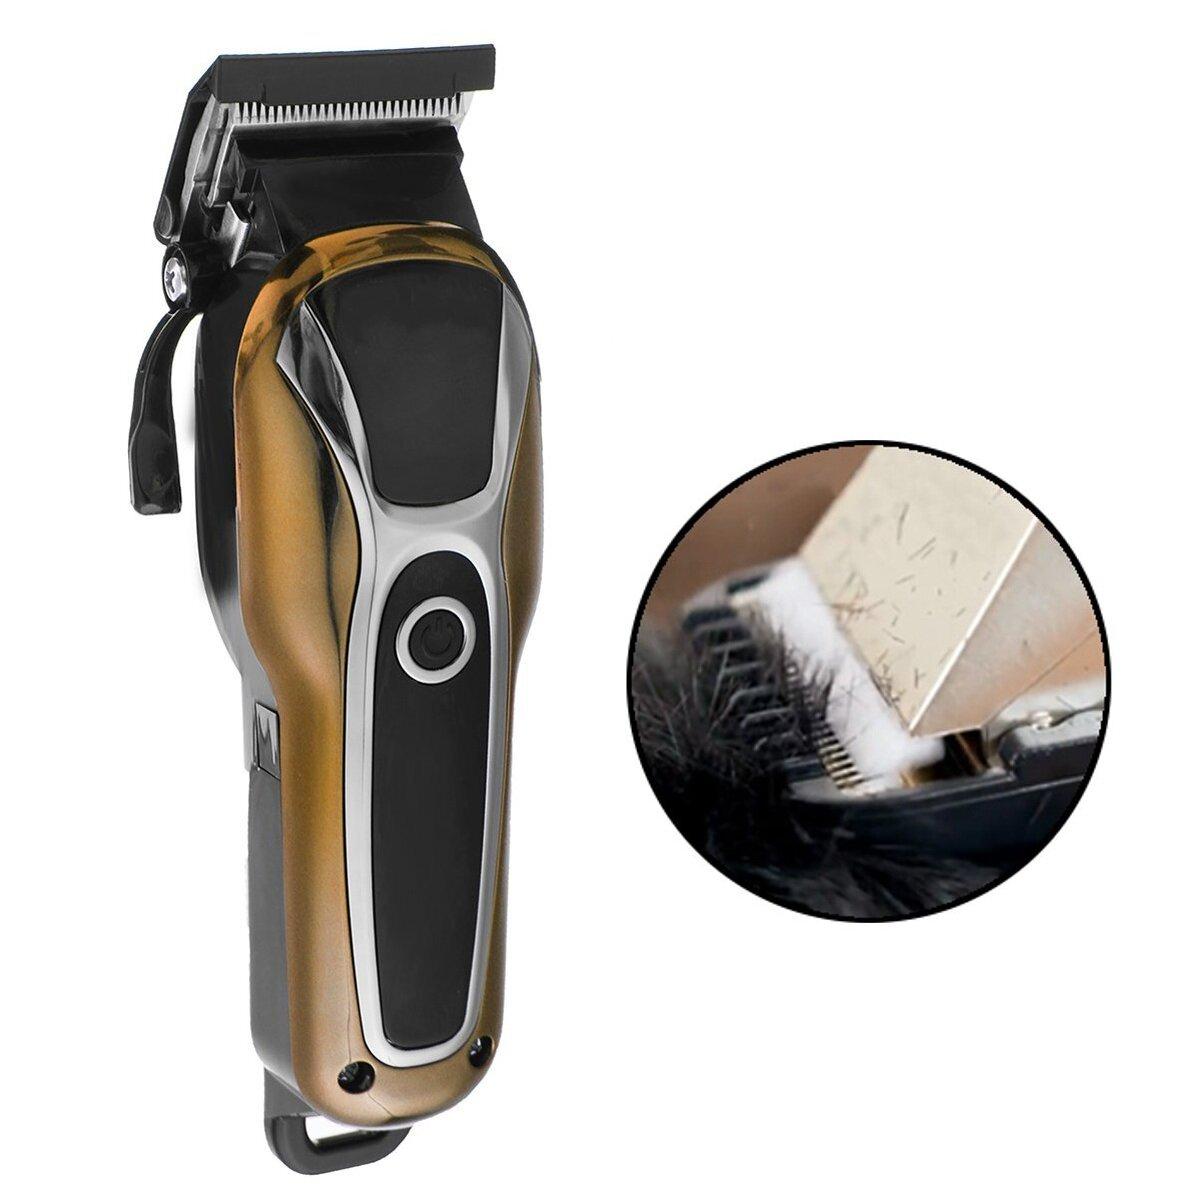 Surker SK-803 LCD Display Electric Hair Clipper High Power Detachable Head Cutting Comb